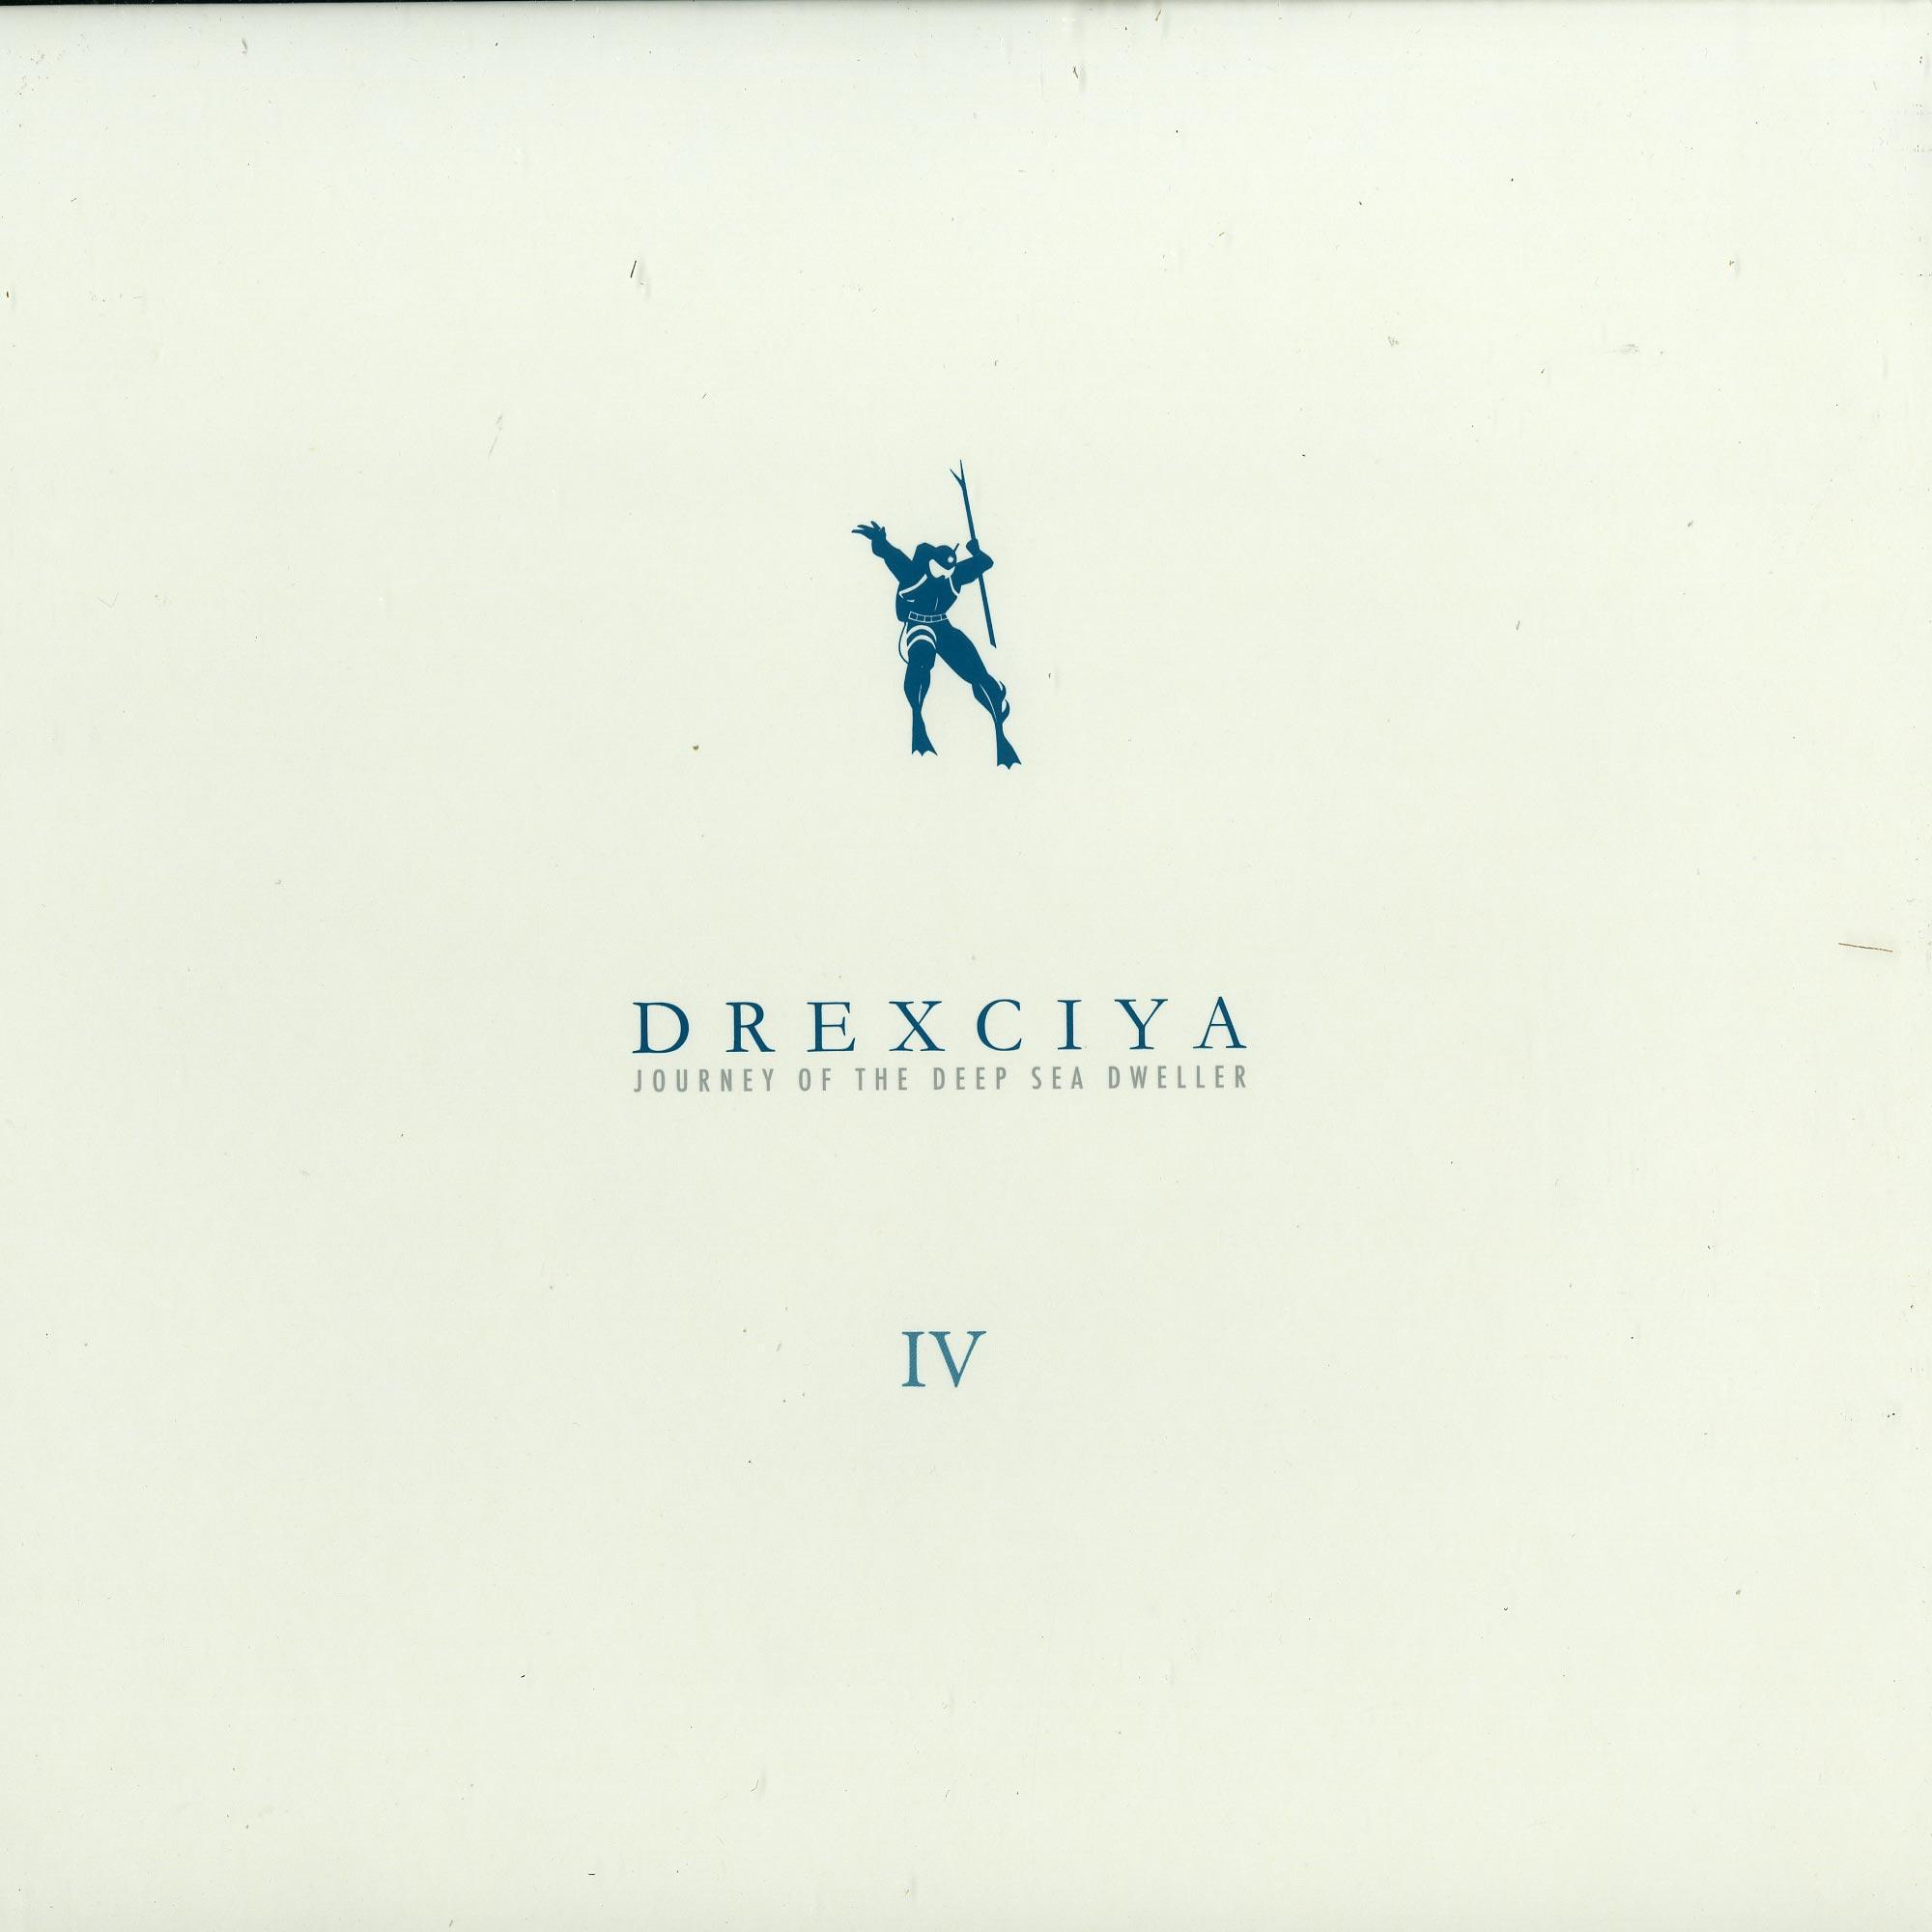 Drexciya - JOURNEY OF THE DEEP SEA DWELLER - PART 4